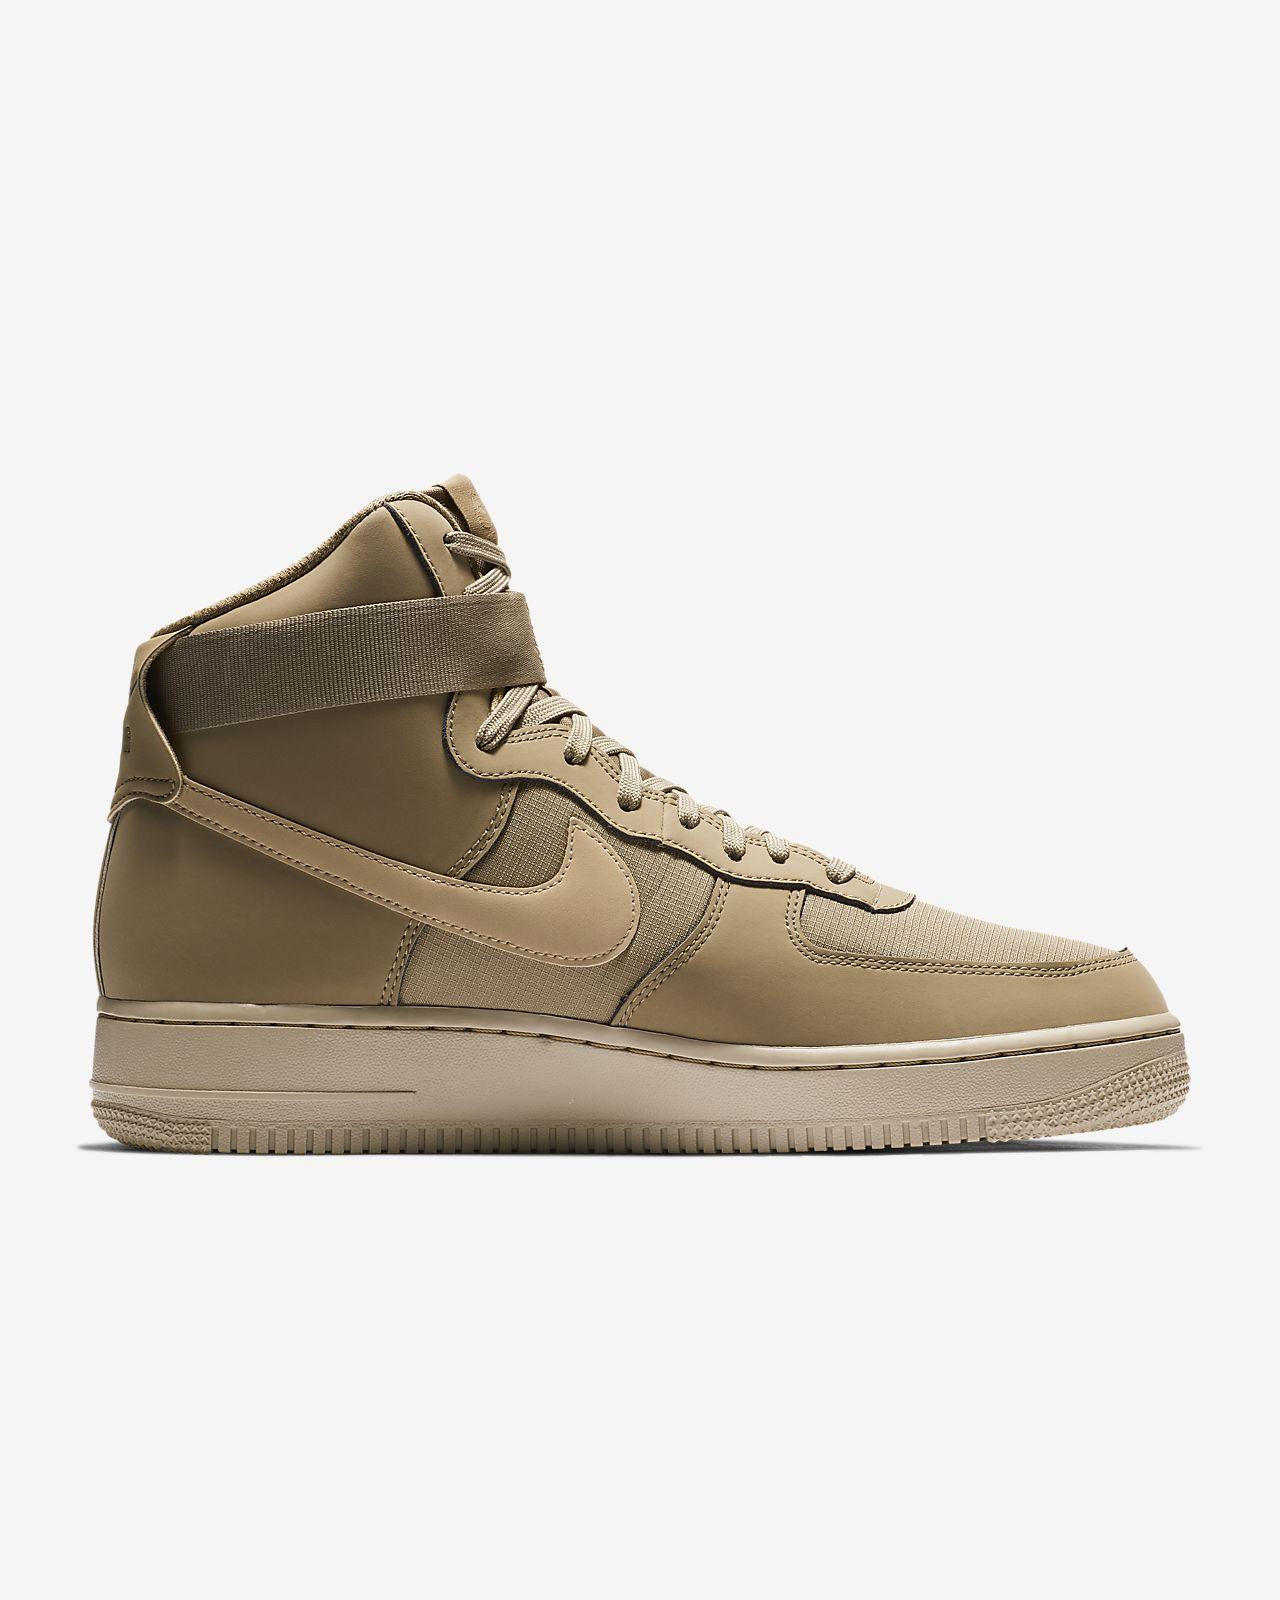 promo code af1e1 74a90 ... Nike Air Force 1 High 07 Men s Shoe